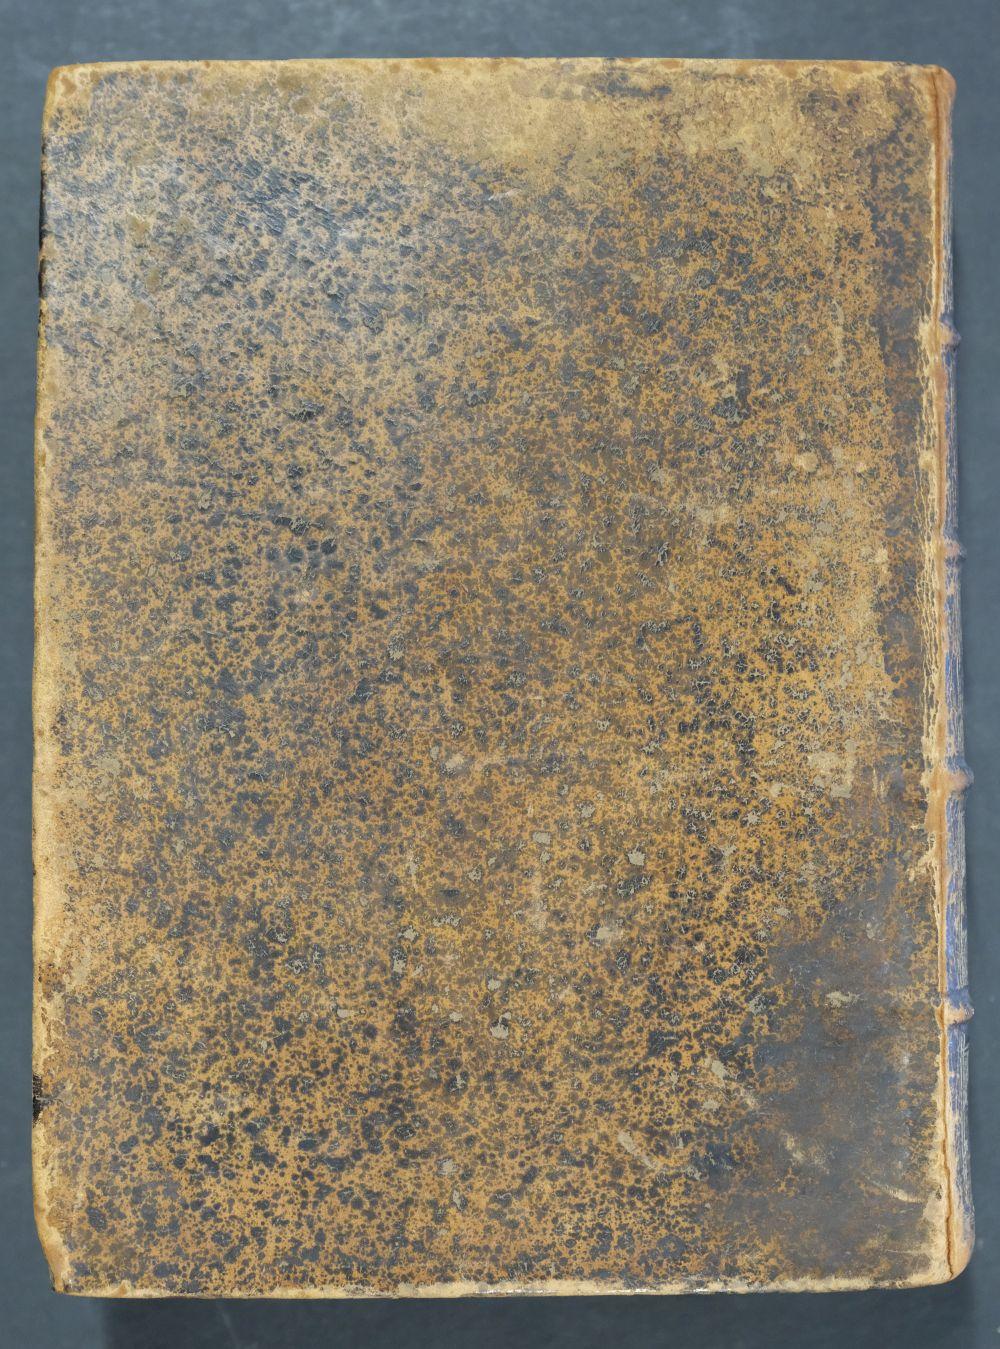 Erizzo (Sebastiano). Discorso sopra le medaglie, 4th edition, 1584, ex libris Fletcher of Saltoun - Image 4 of 11